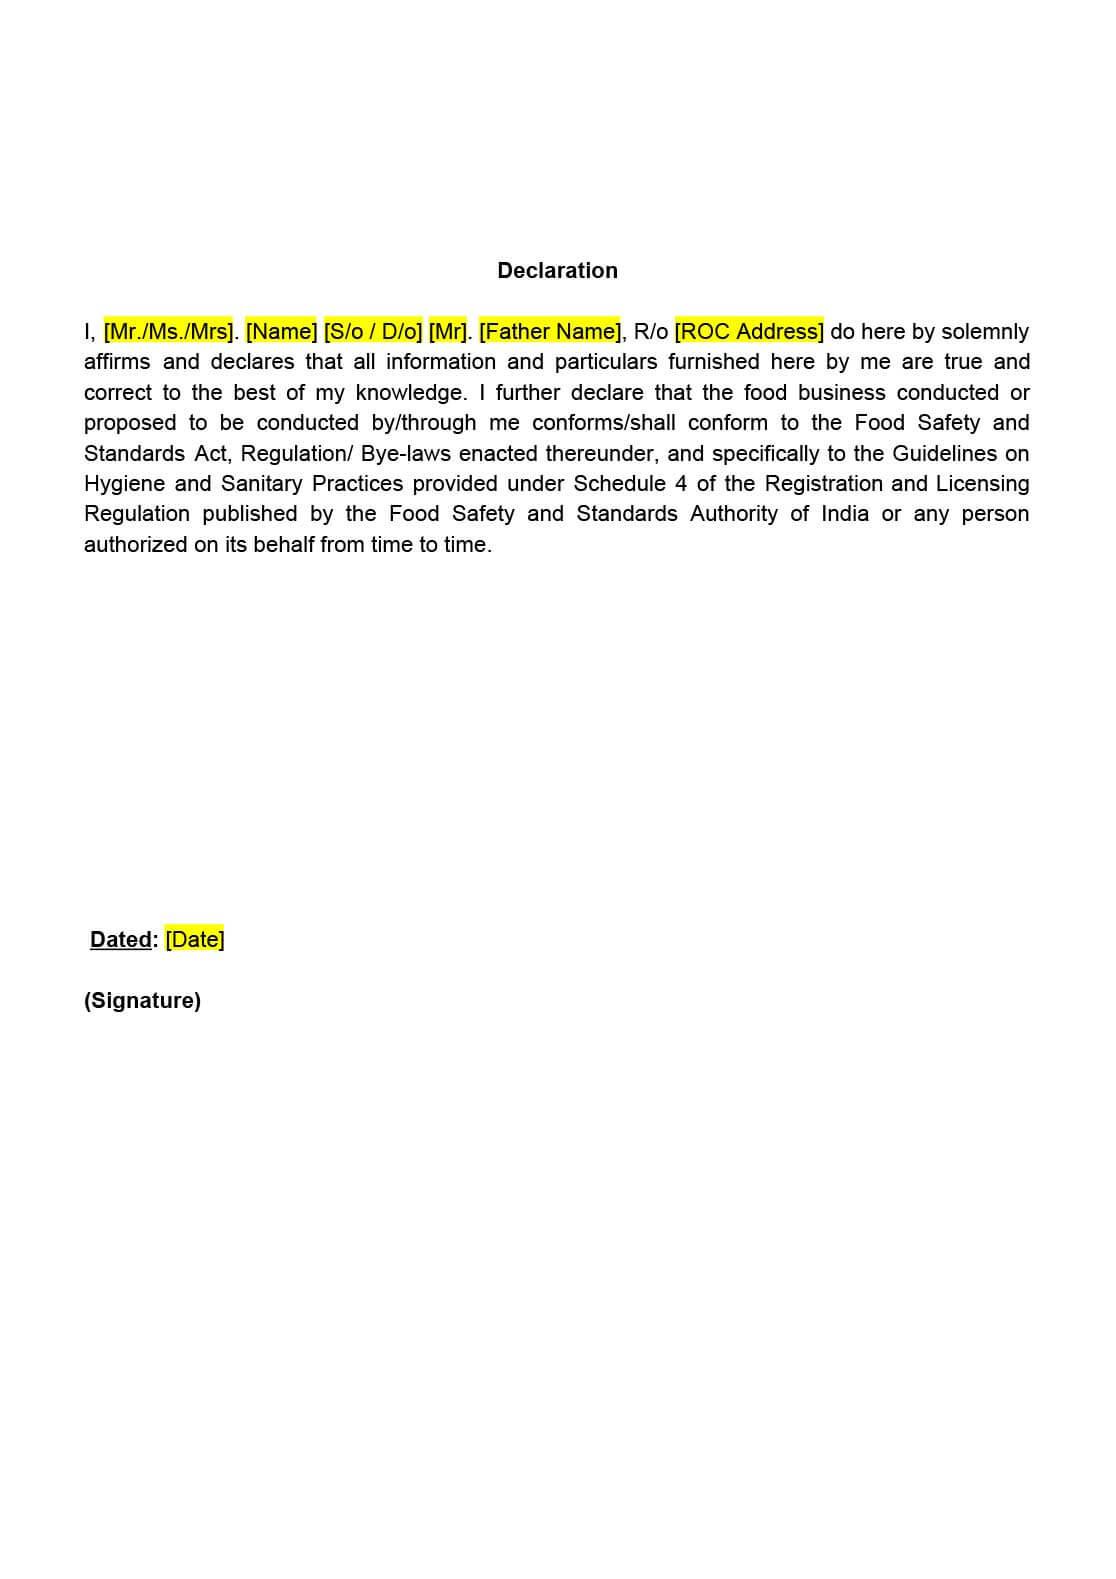 FSSAI Declaration Format